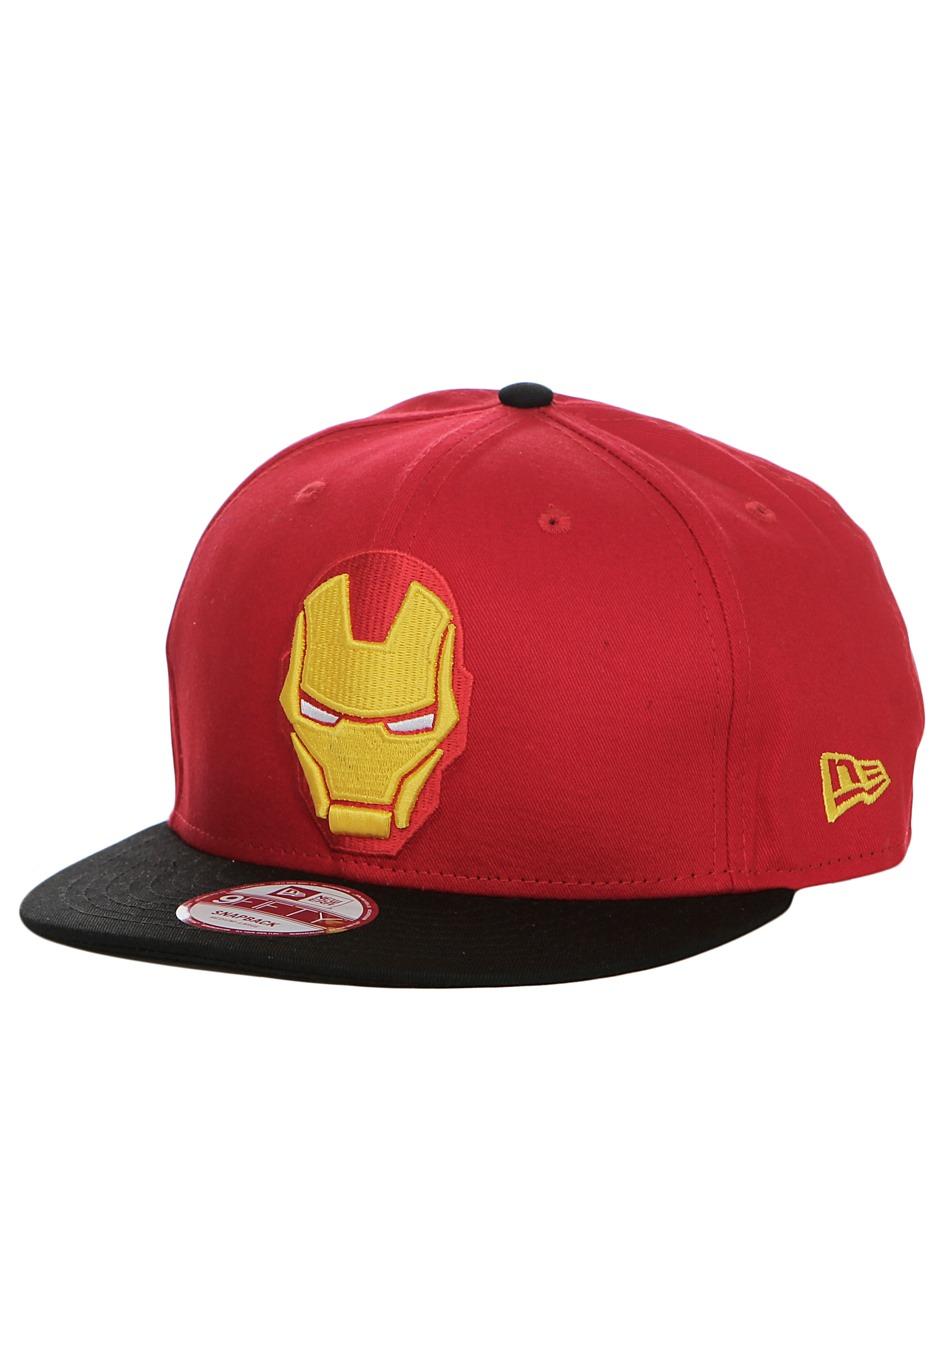 9910fd60df9 ... get new era avengers logo iron man black red snapback cap e9428 0f5f7